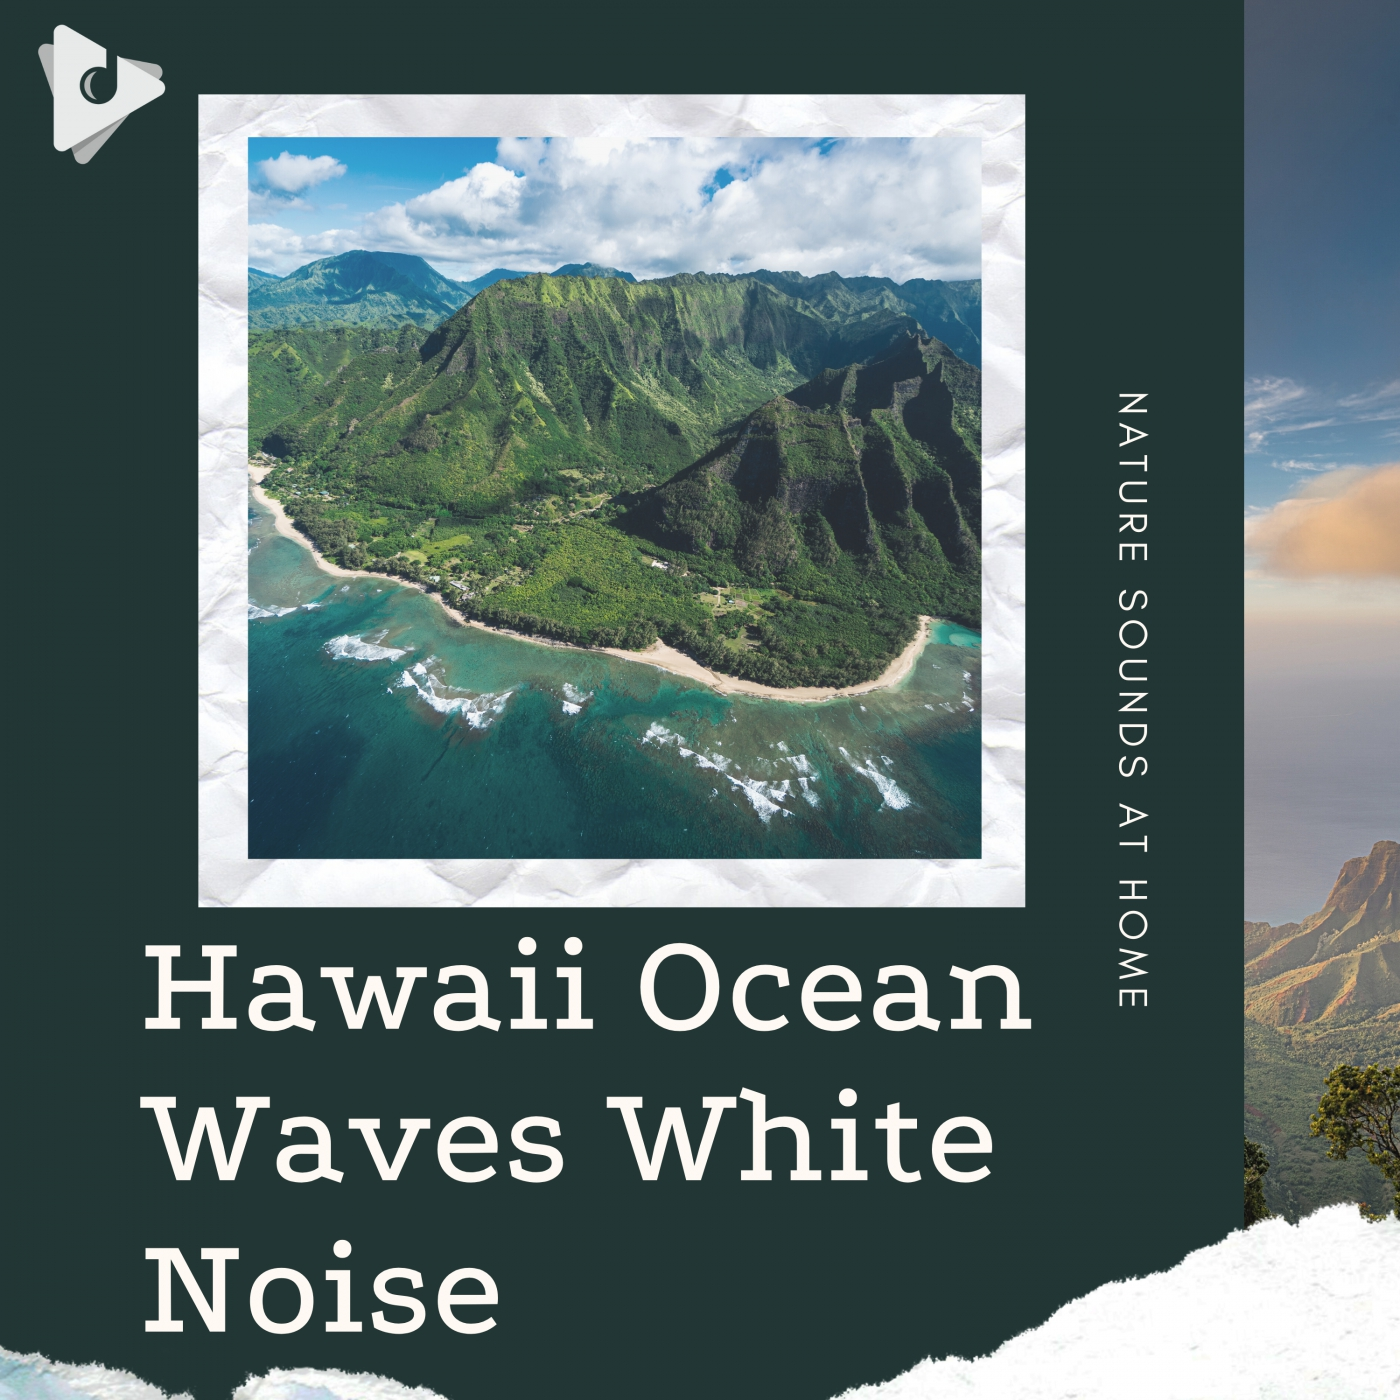 Hawaii Ocean Waves White Noise